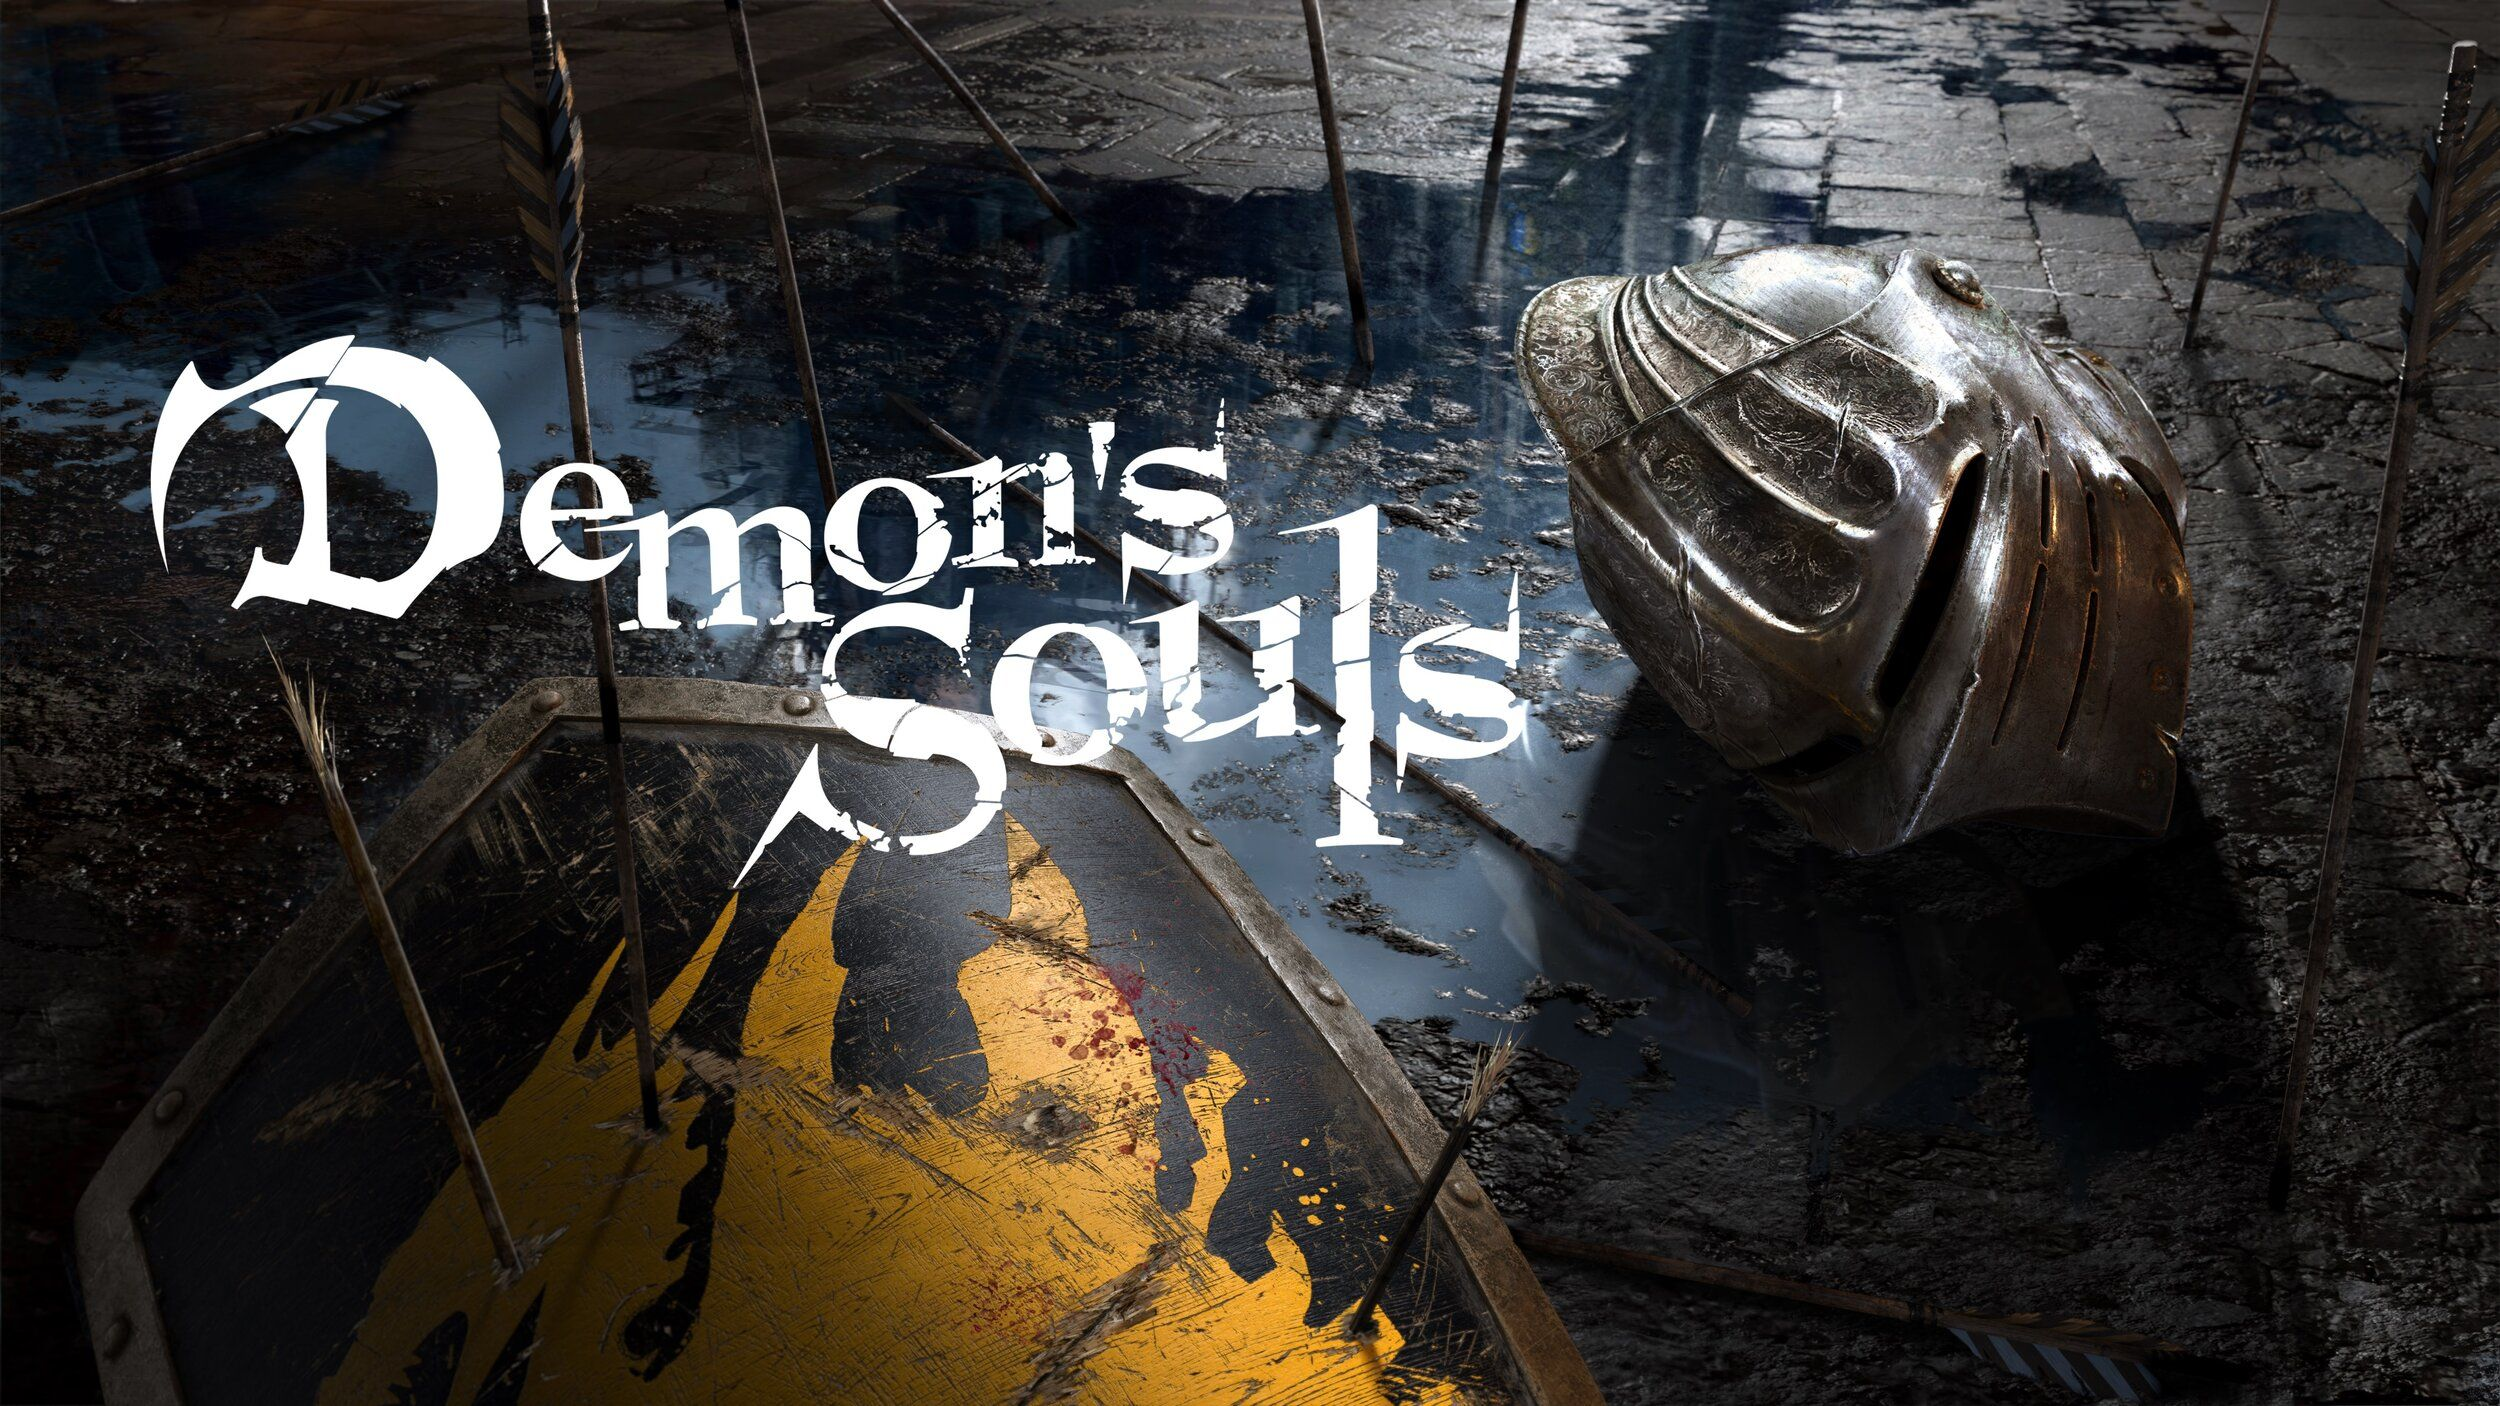 Demon's Souls Wallpapers - Top Free Demon's Souls Backgrounds -  WallpaperAccess